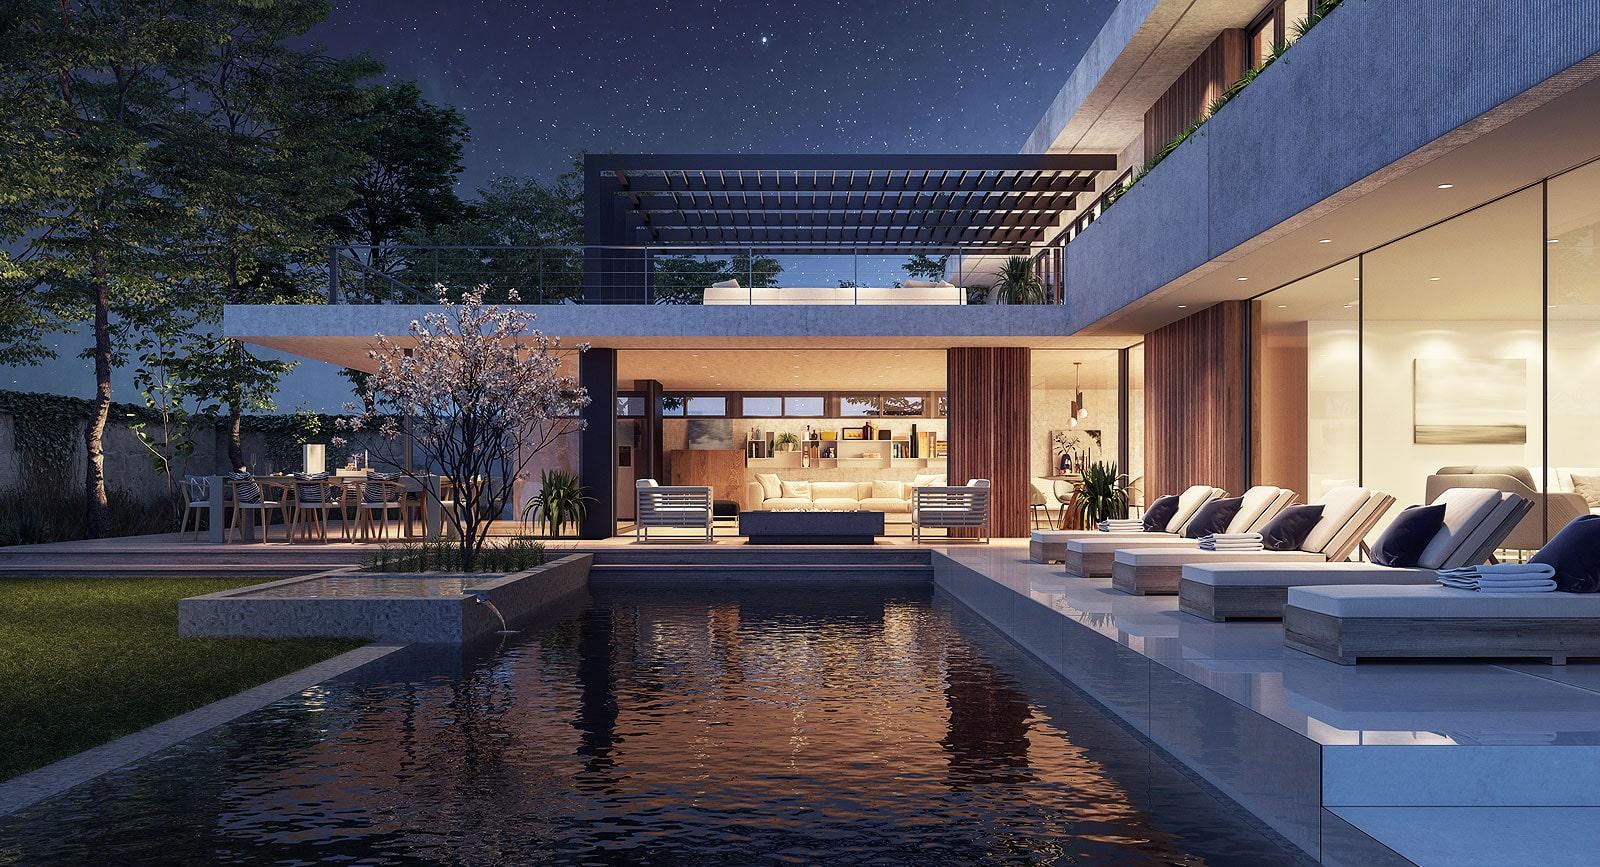 Luxury Swimming Pool during NIghttime